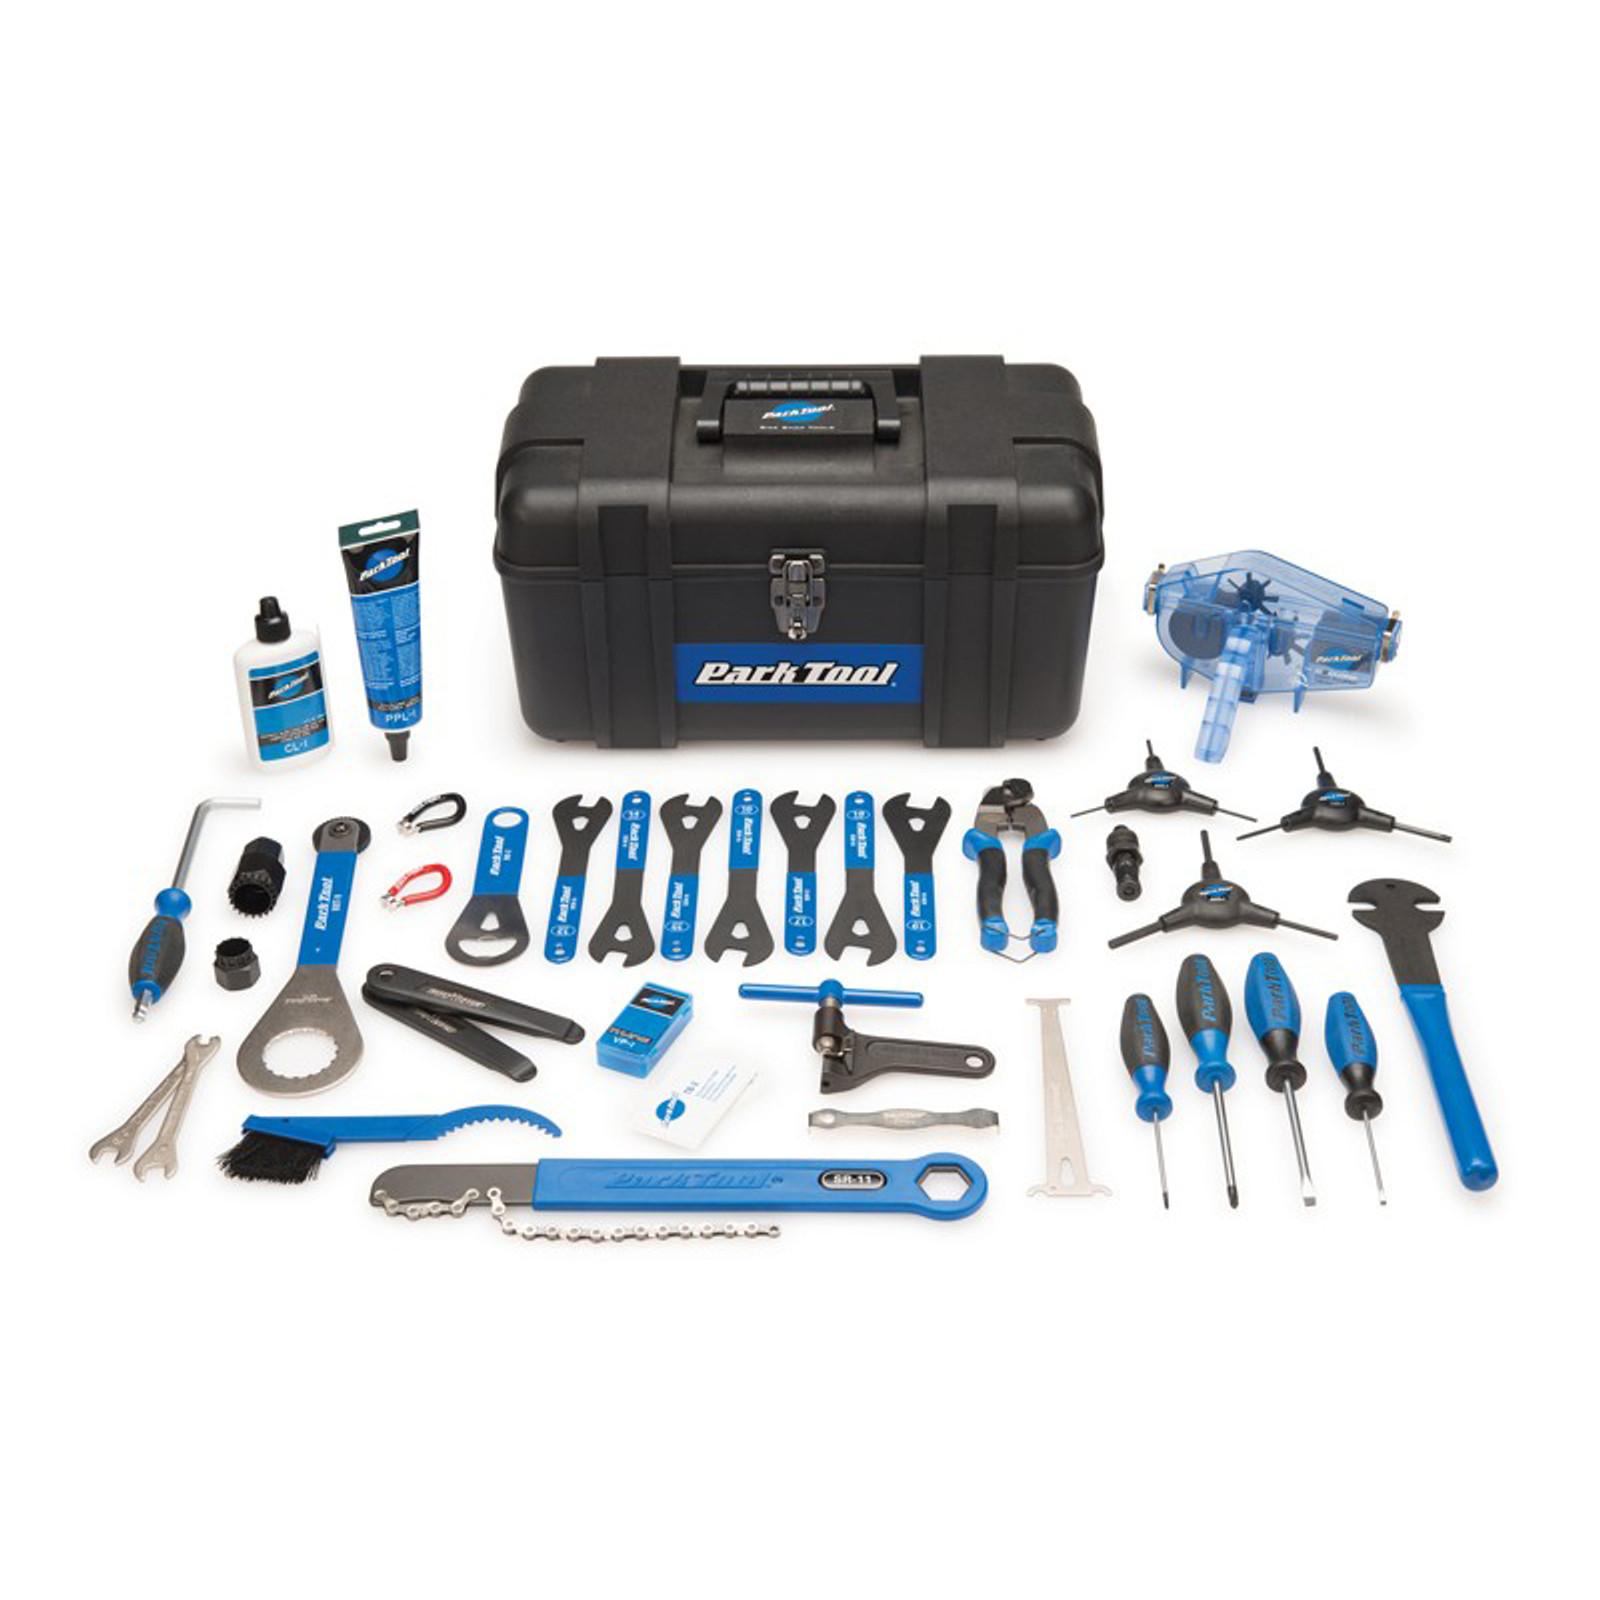 Advanced Mechanic Tool Kit